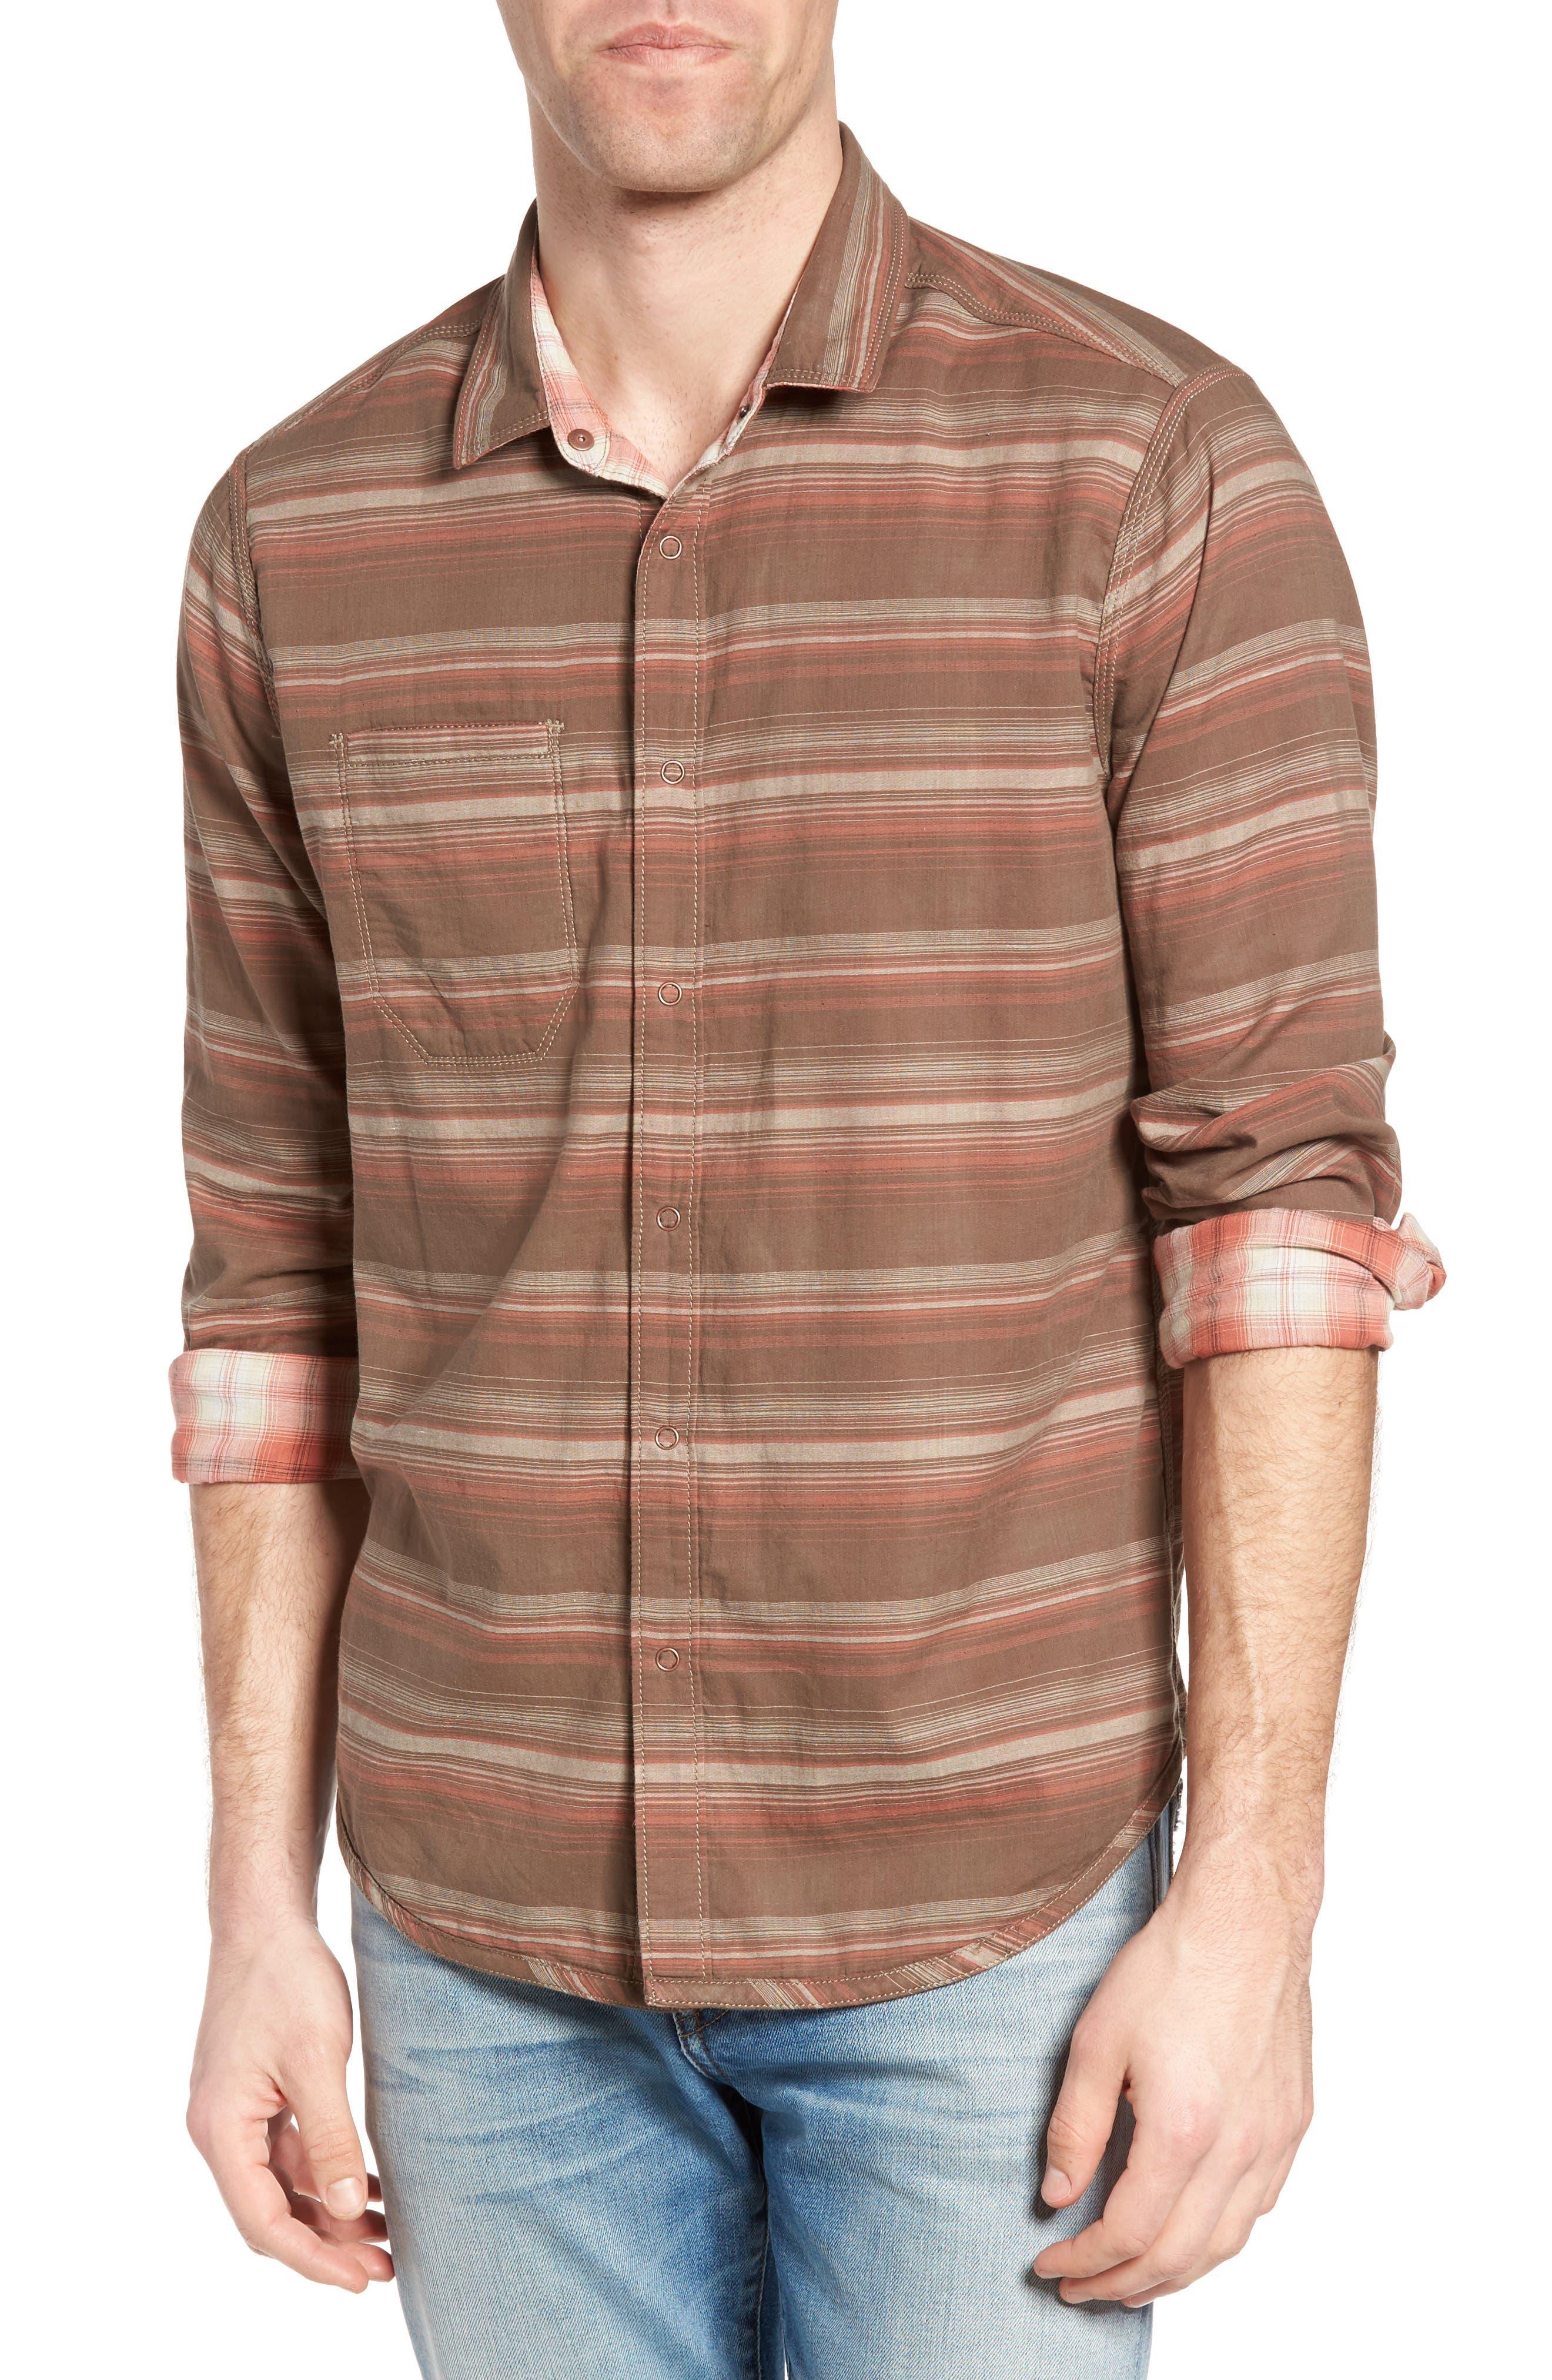 Vogel Regular Fit Reversible Plaid Sport Shirt,                             Alternate thumbnail 4, color,                             201